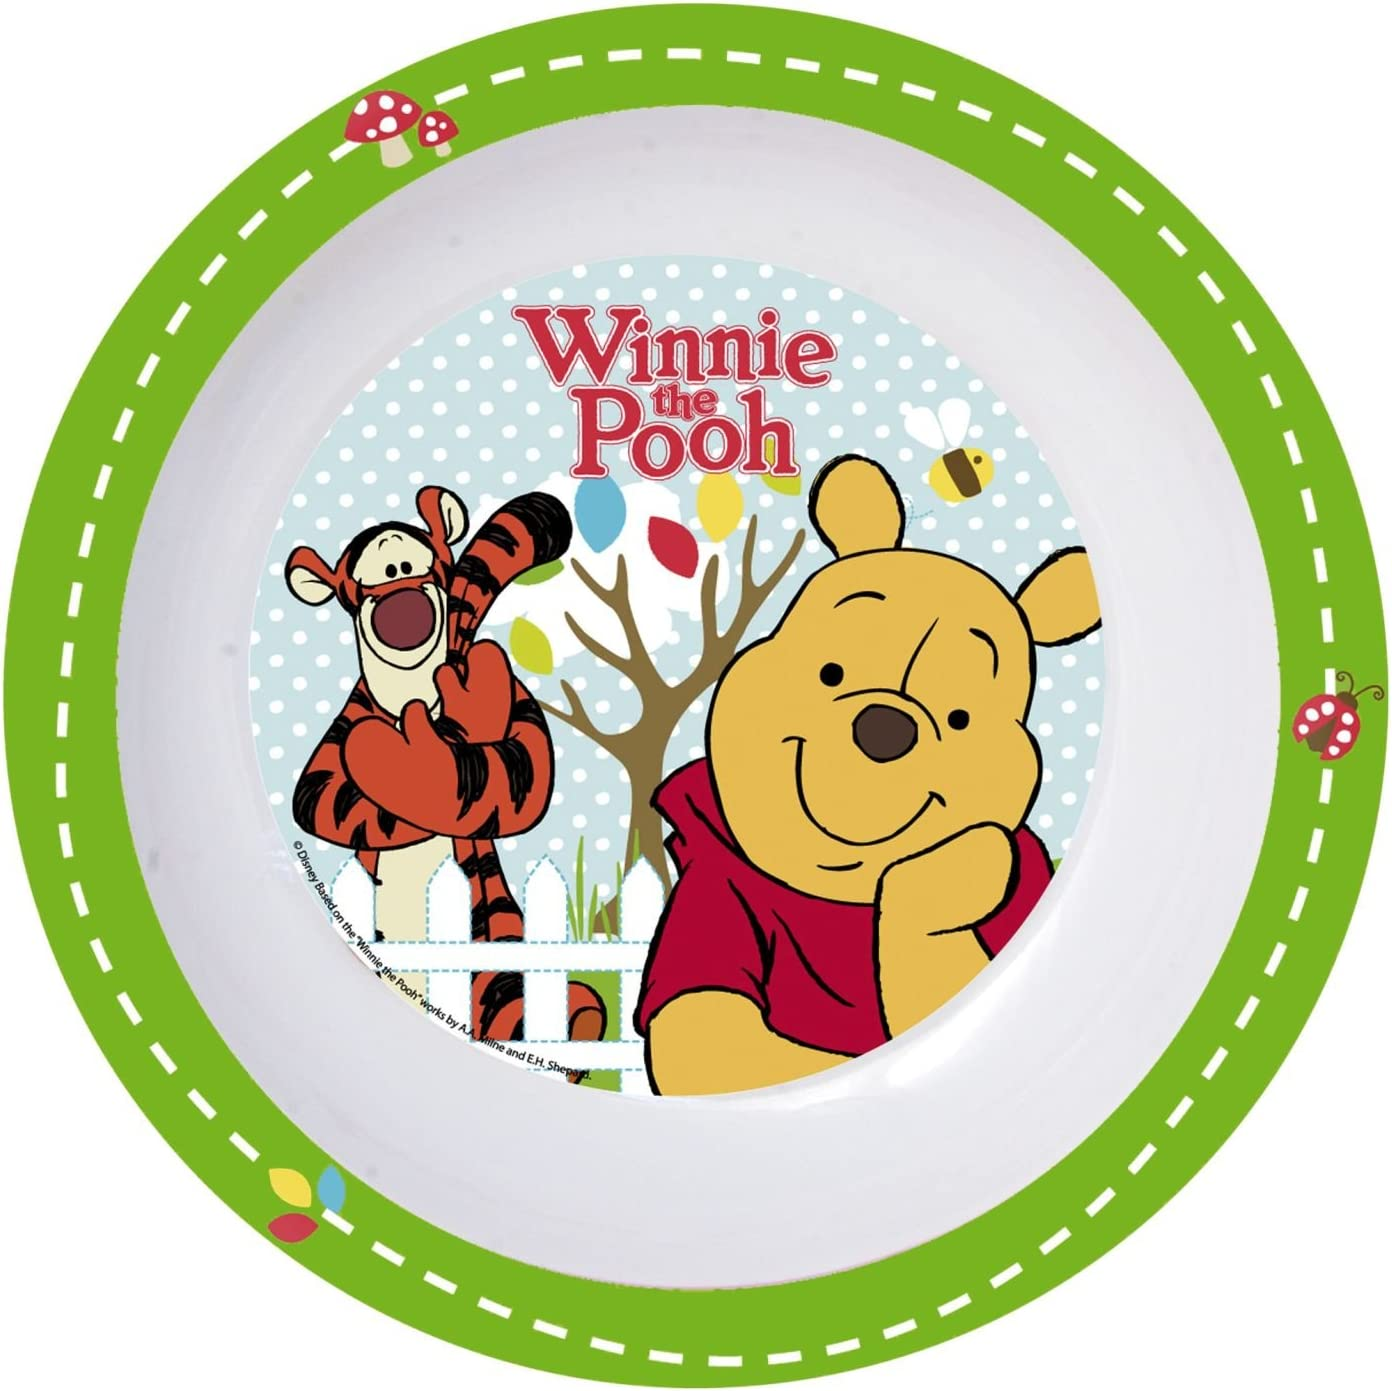 p: os 68916 Placa profunda Disney Winnie the Pooh, melamina, diámetro 19.5 cm